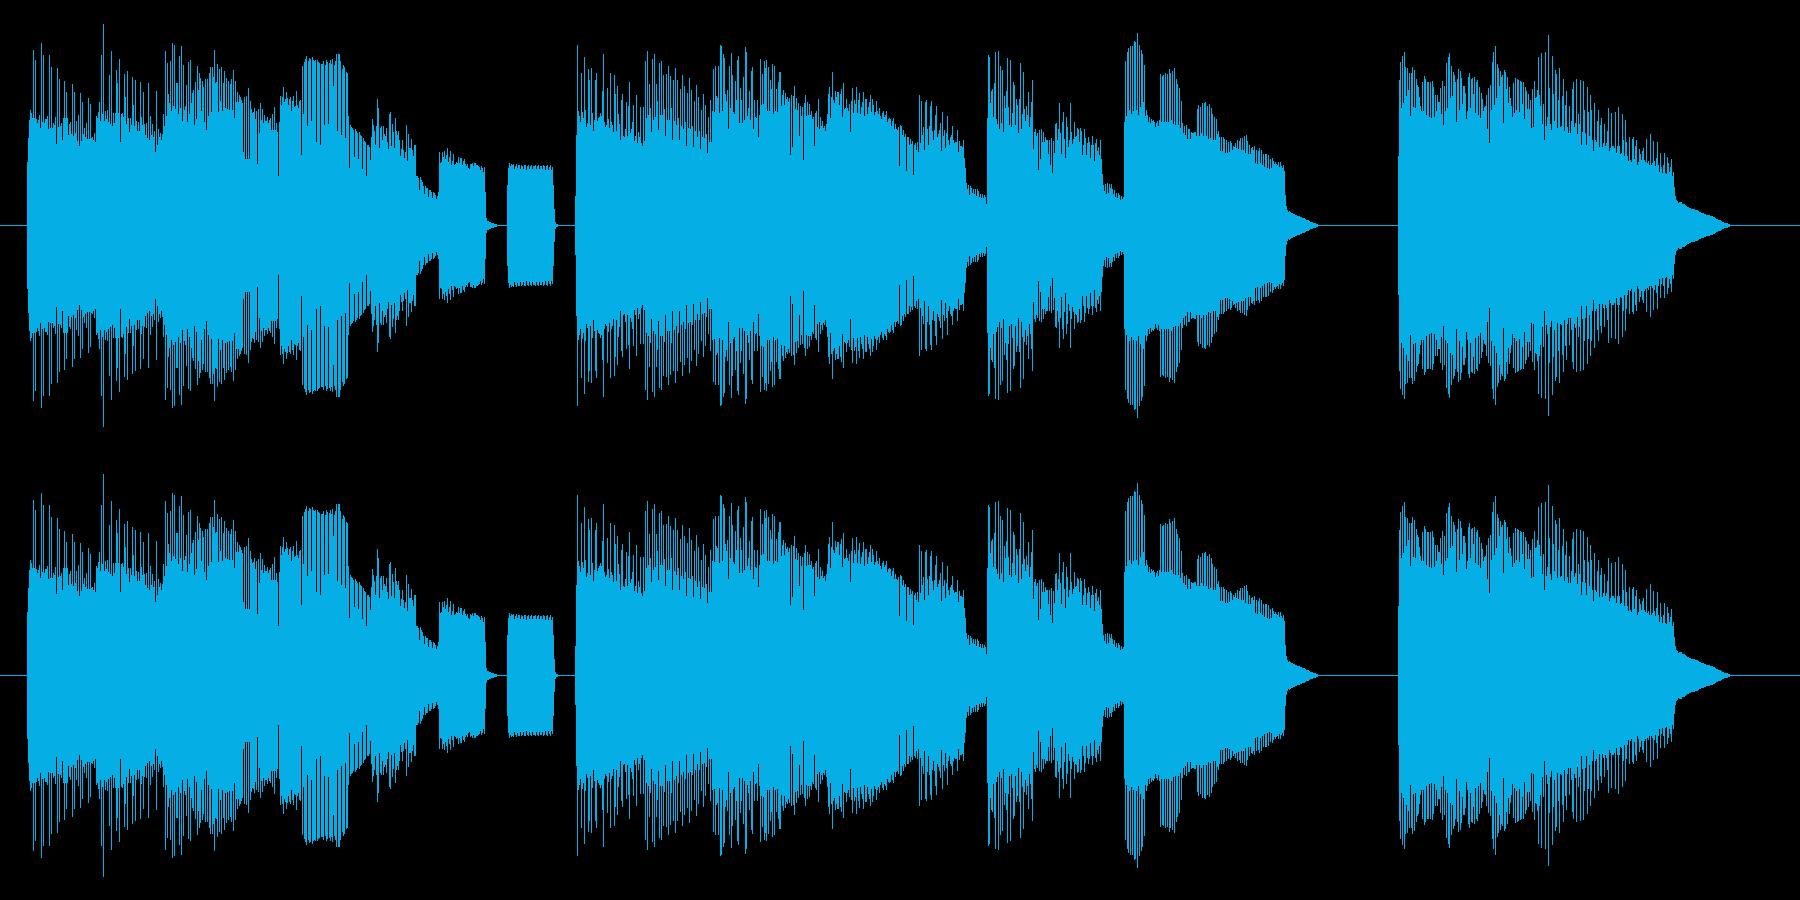 NES STG B04-2(クリア1)の再生済みの波形